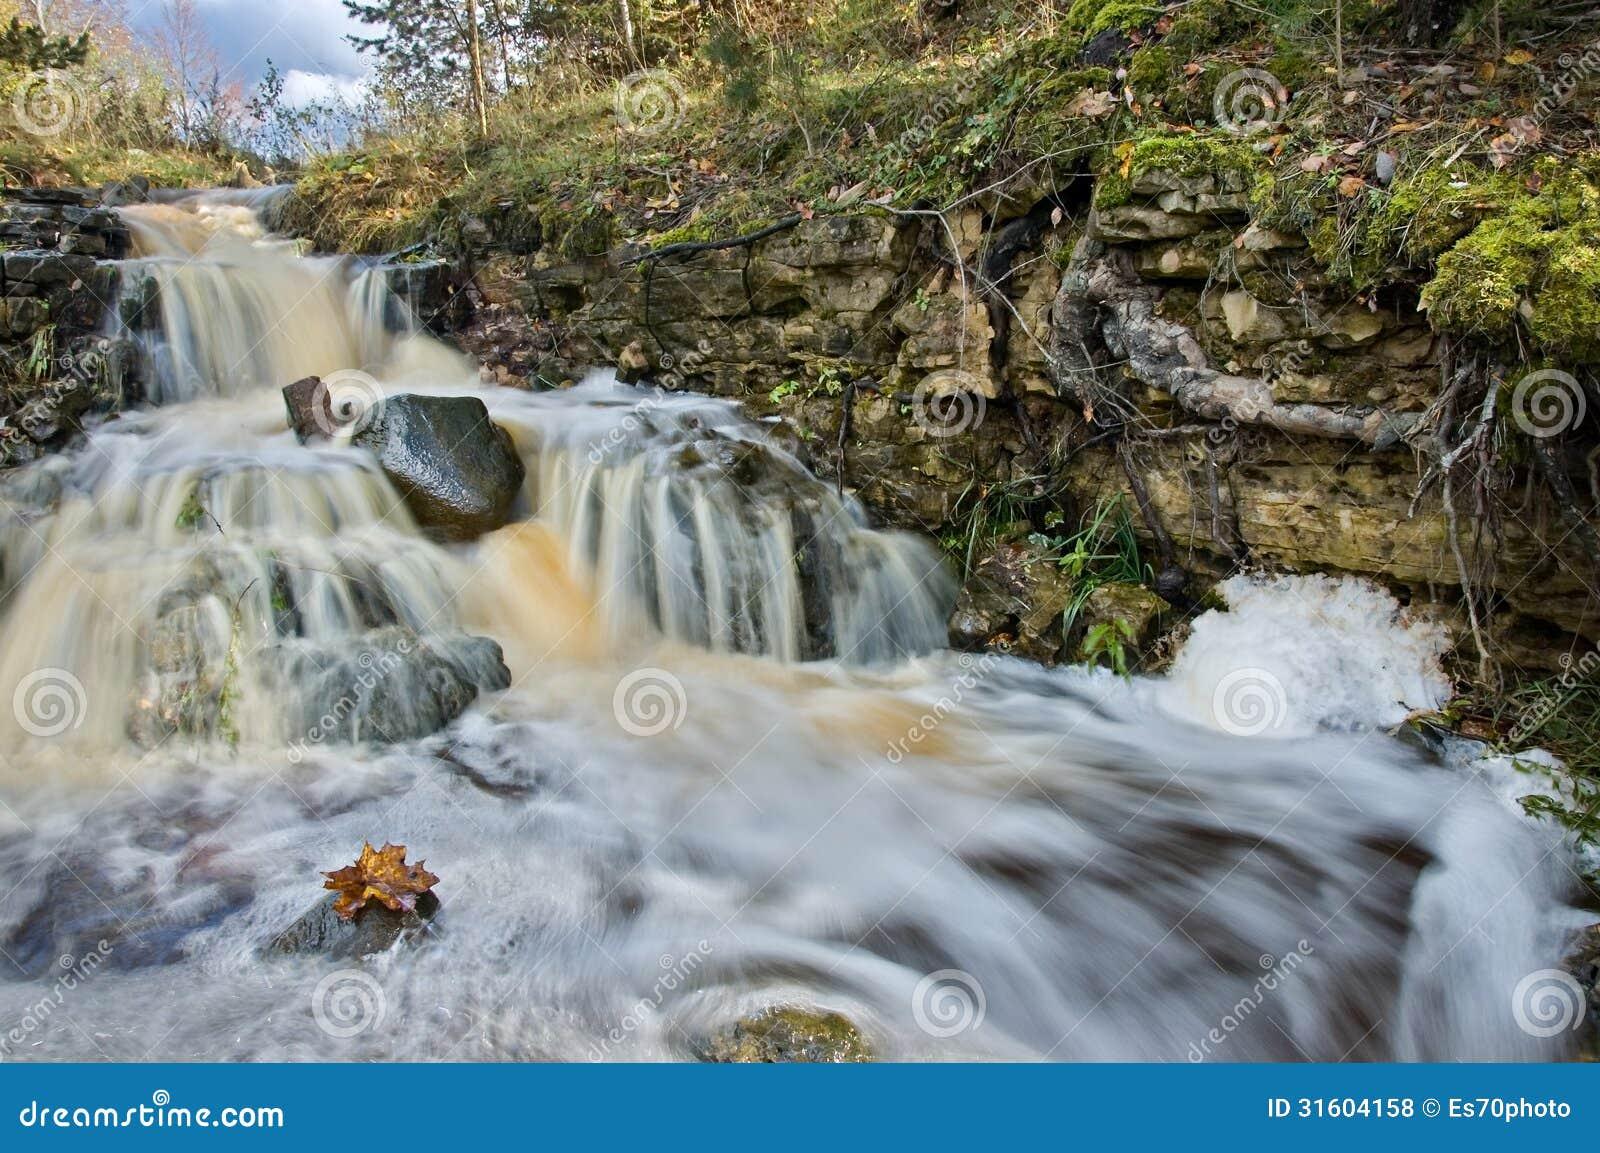 latvian autumn forest river - photo #31